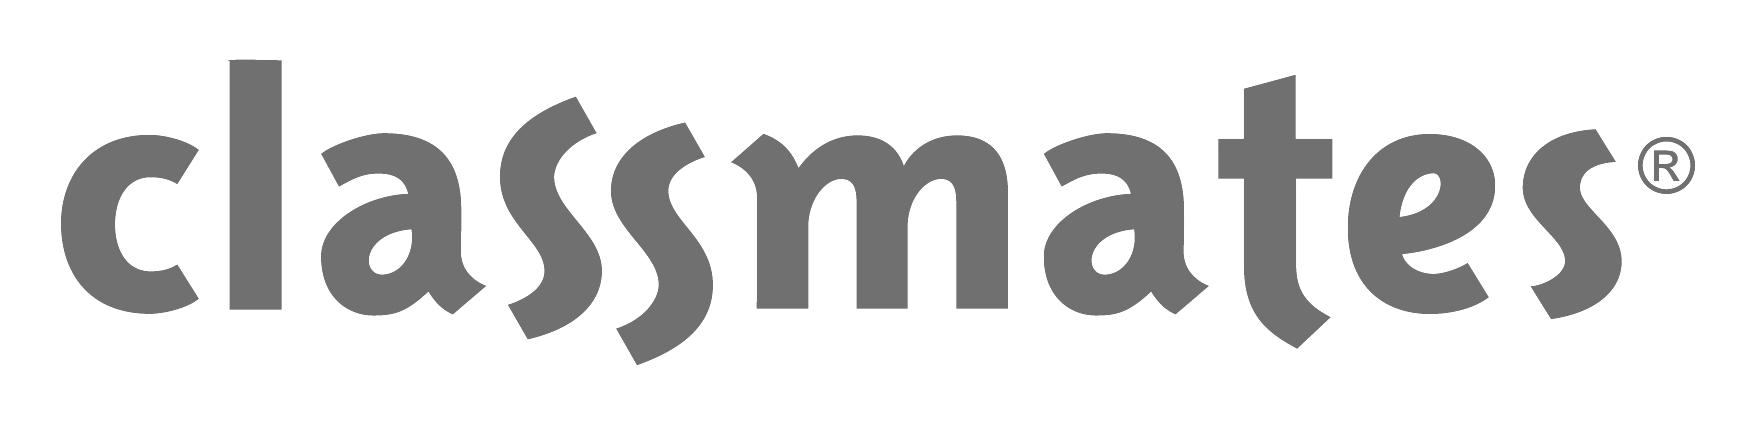 classmates-logo_edited